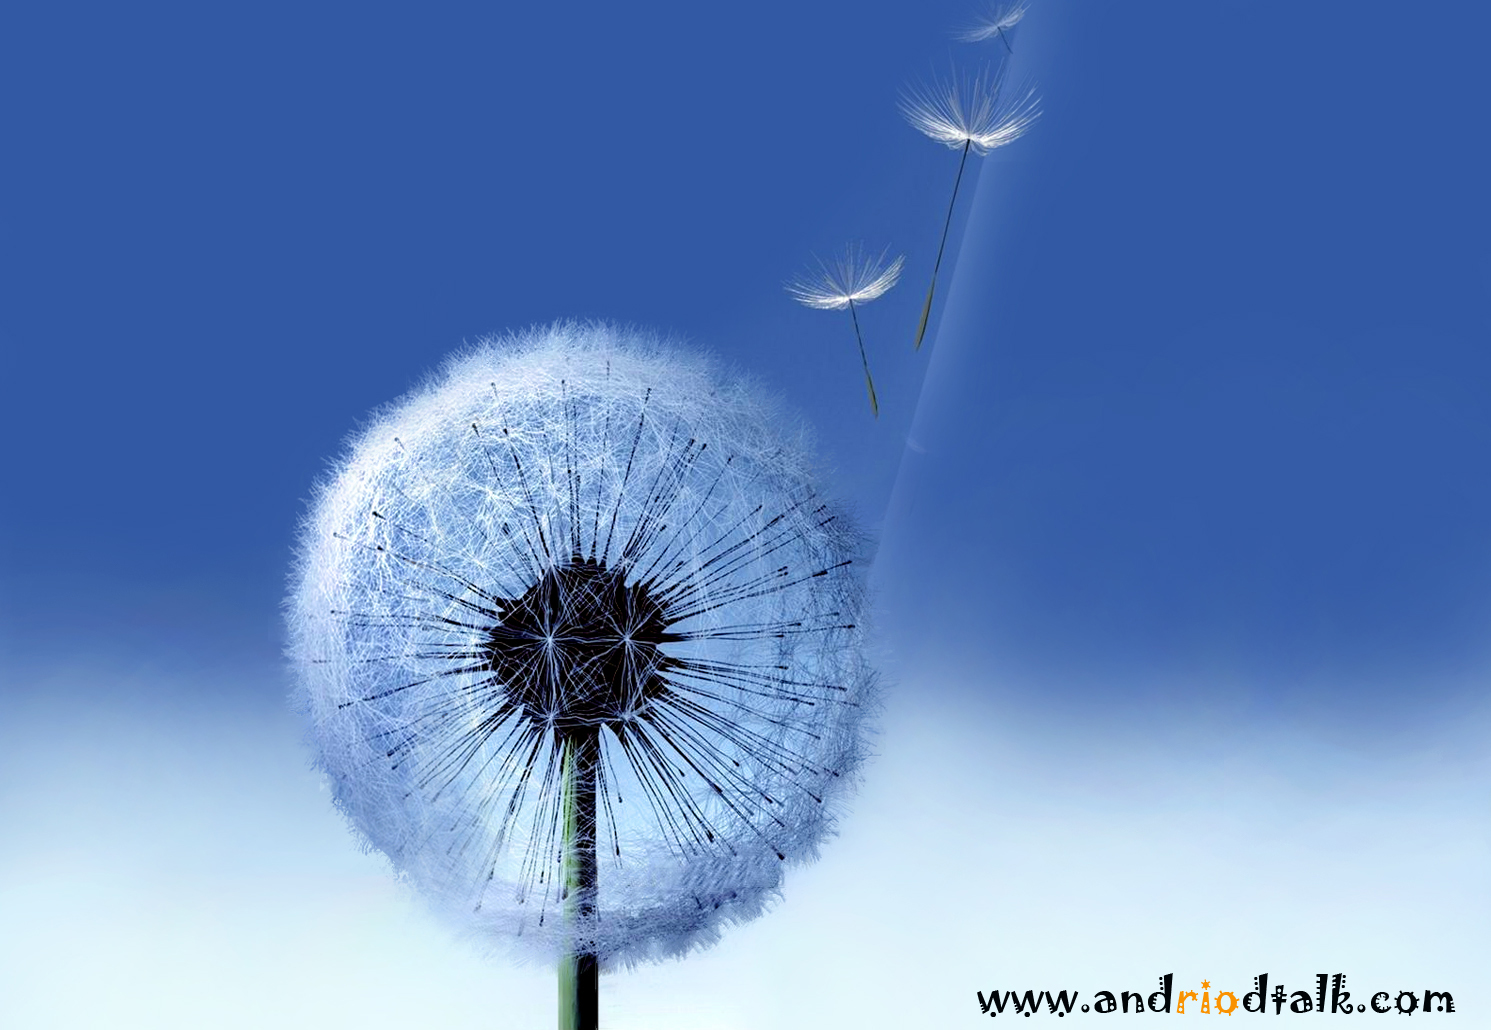 tabletpc app wallpaper com live wallpaper bubble filesize 480x854 53k 1491x1030